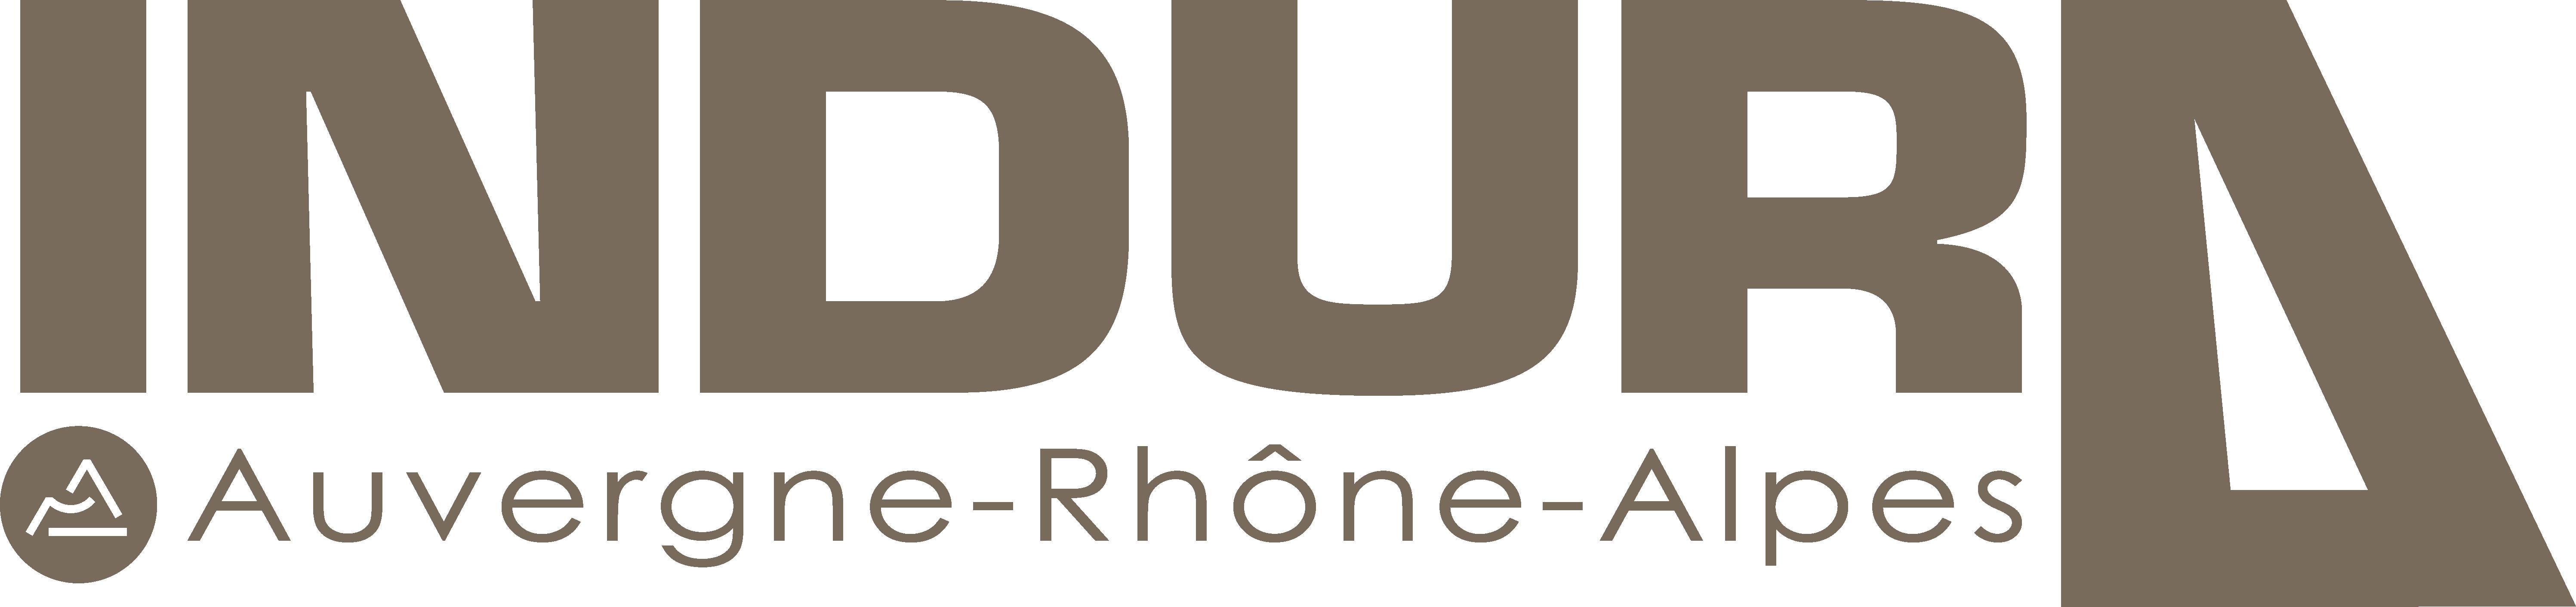 Logo Indura 2020